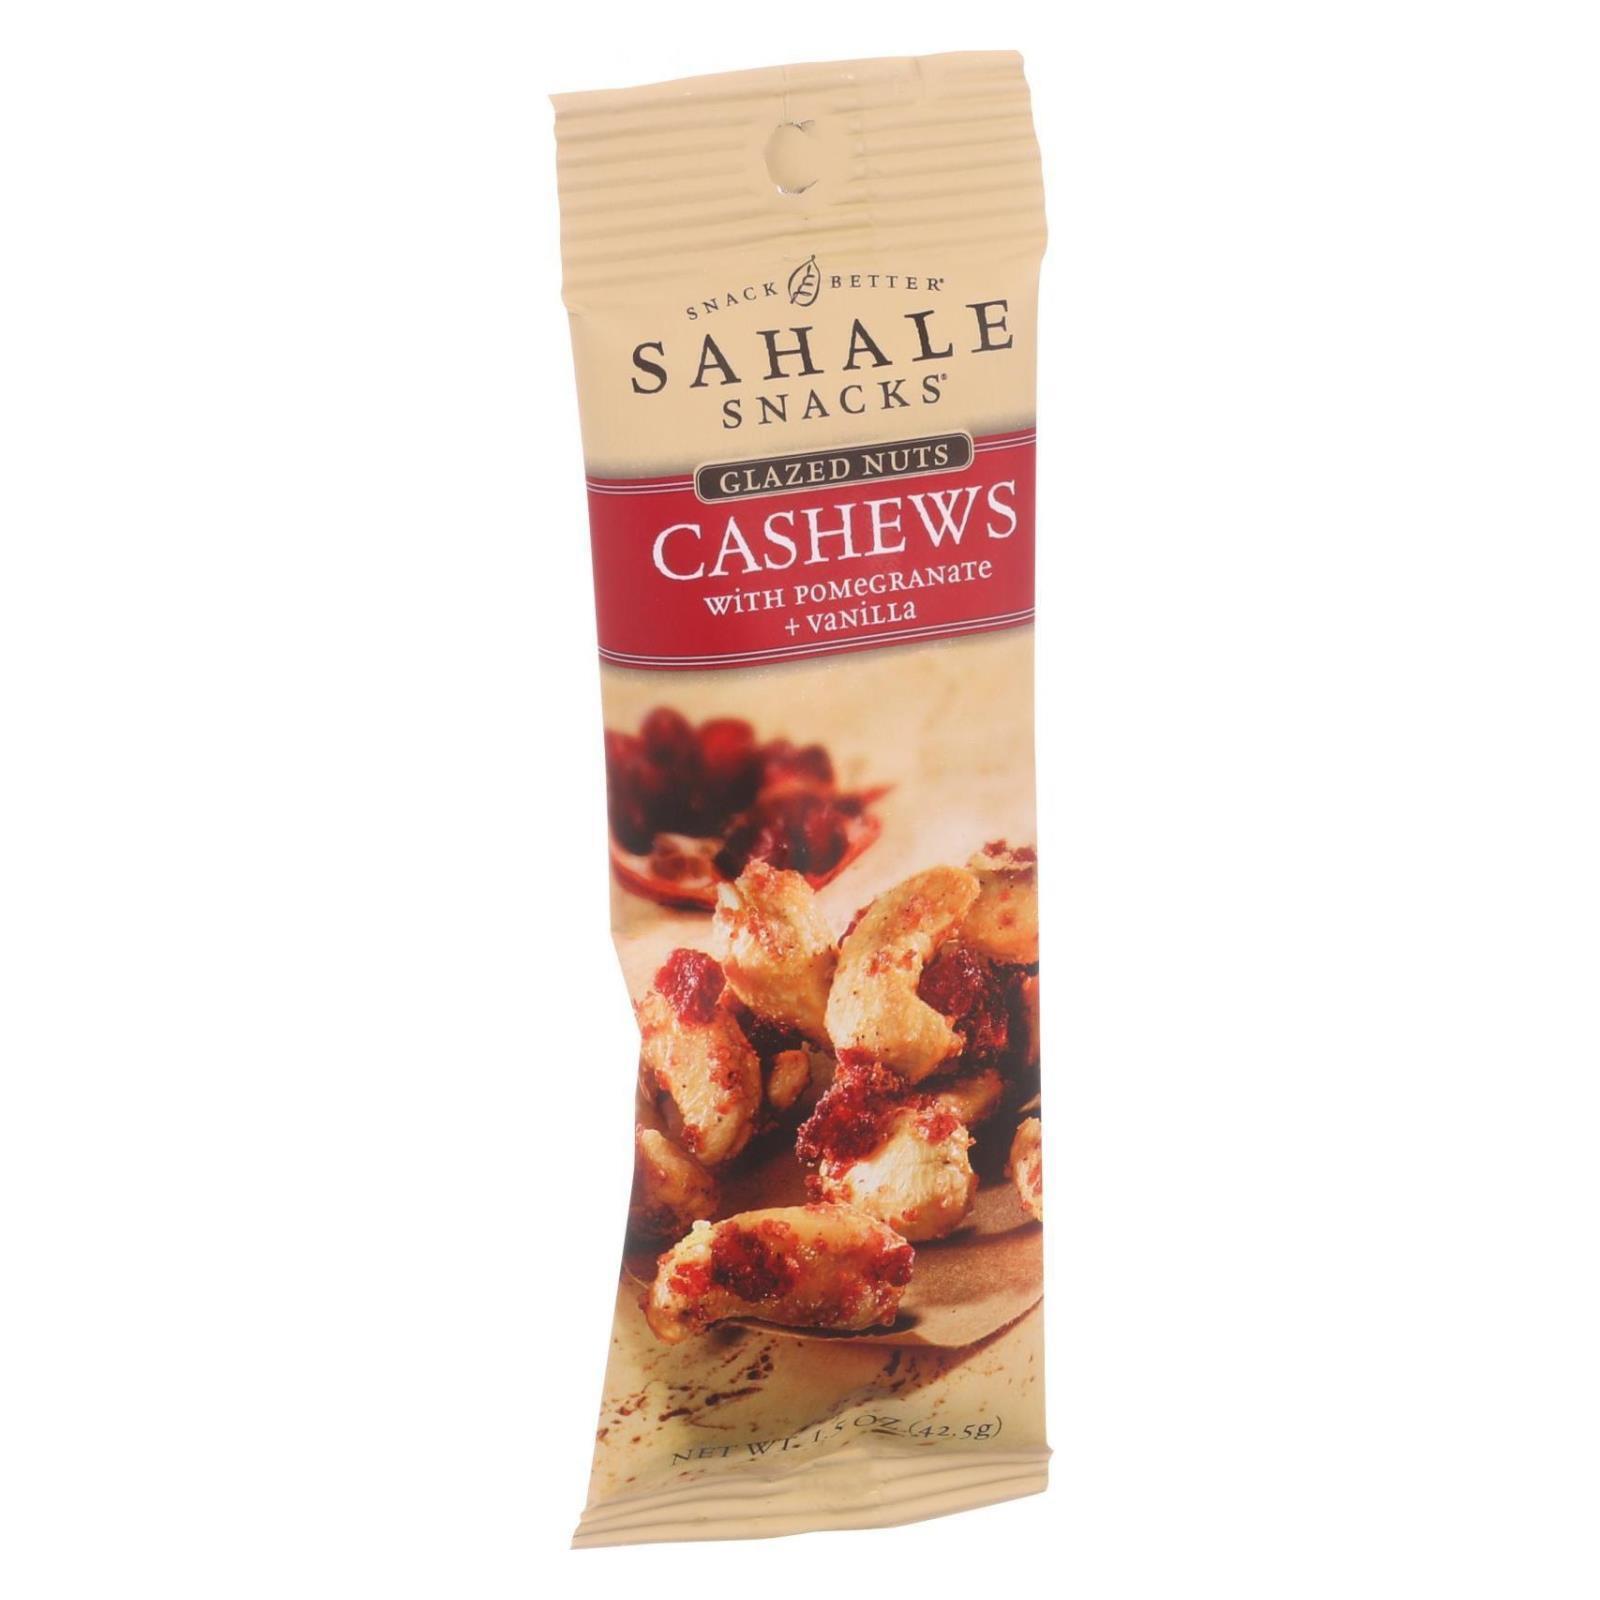 Sahale Snacks Glazed Nuts - Cashews with Pomegranate and Vanilla - 1.5 oz - Case of 9